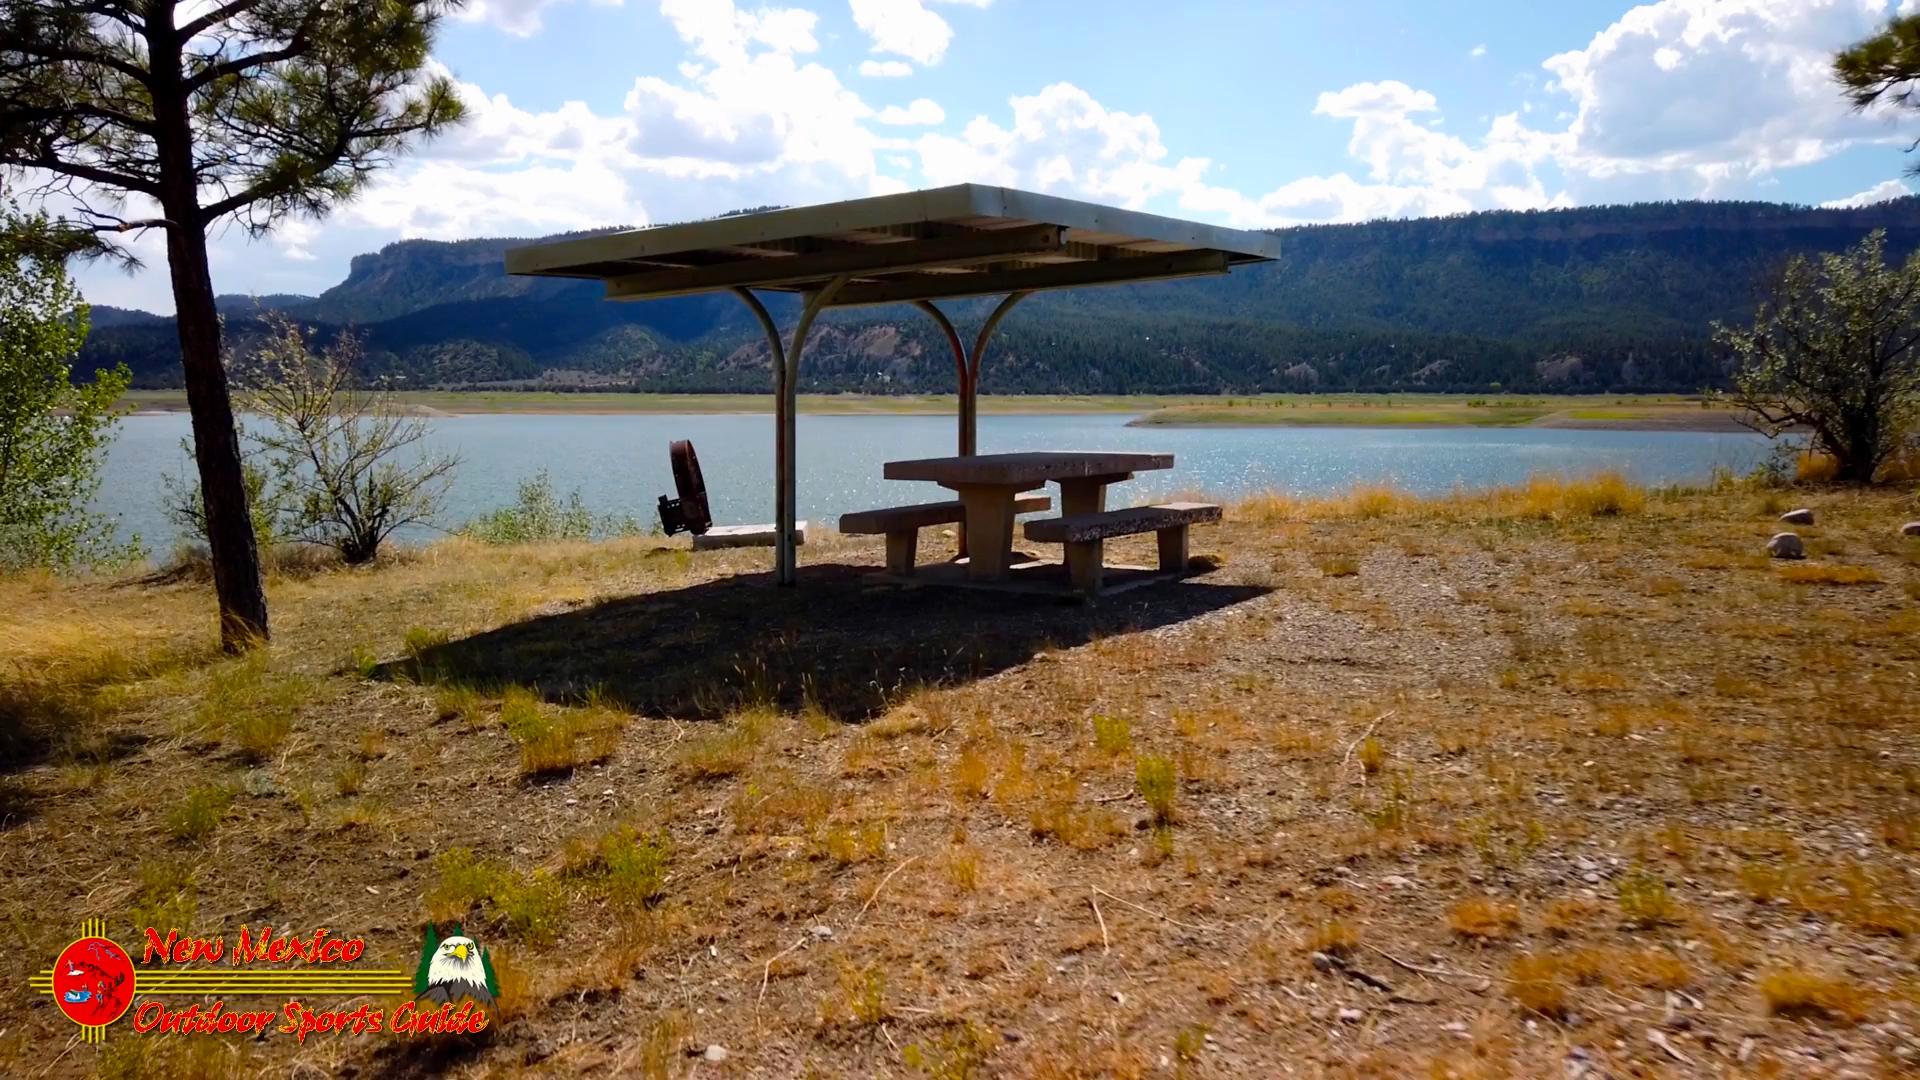 El-Vado-Lake-State-Park-Picnic-Table-Osmo-Pocket-07-14-2020